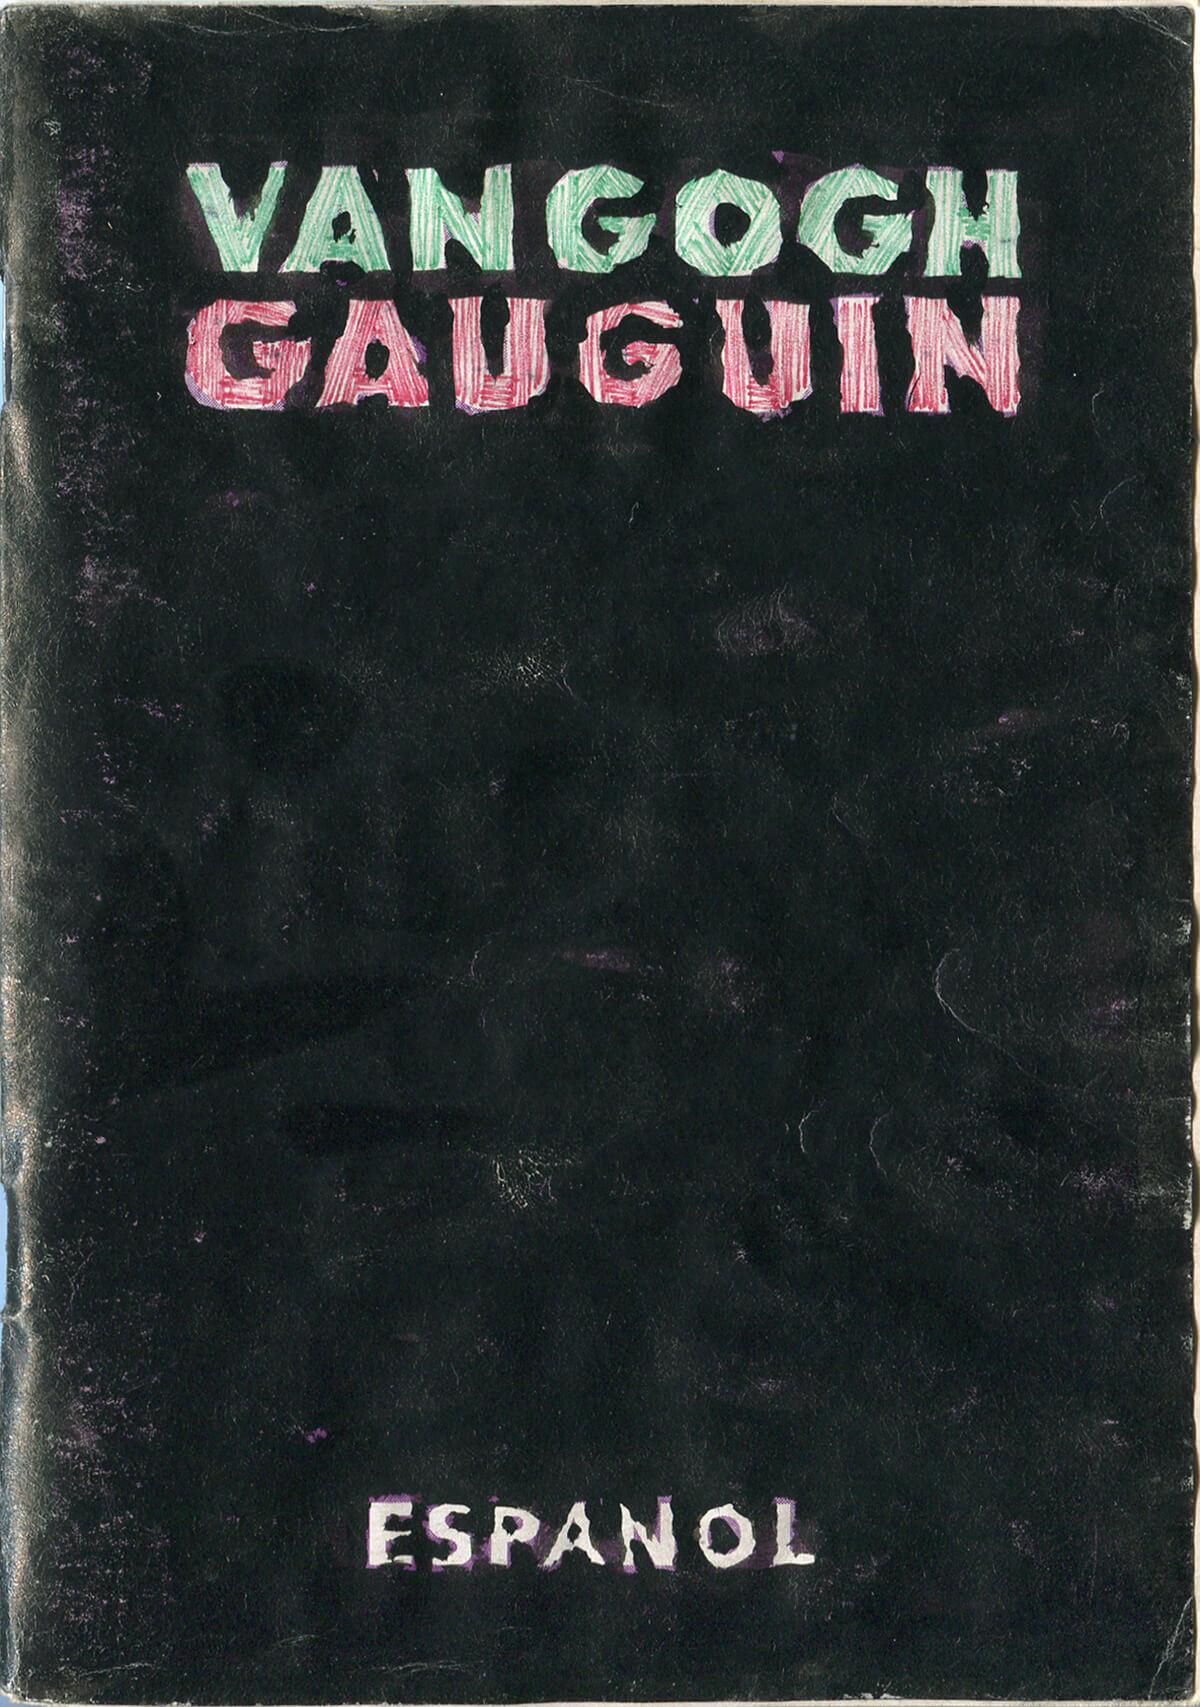 Van Gogh&Gauguin: Characteristics, versión Español, cover, 15 x 10.4 cm, 2002